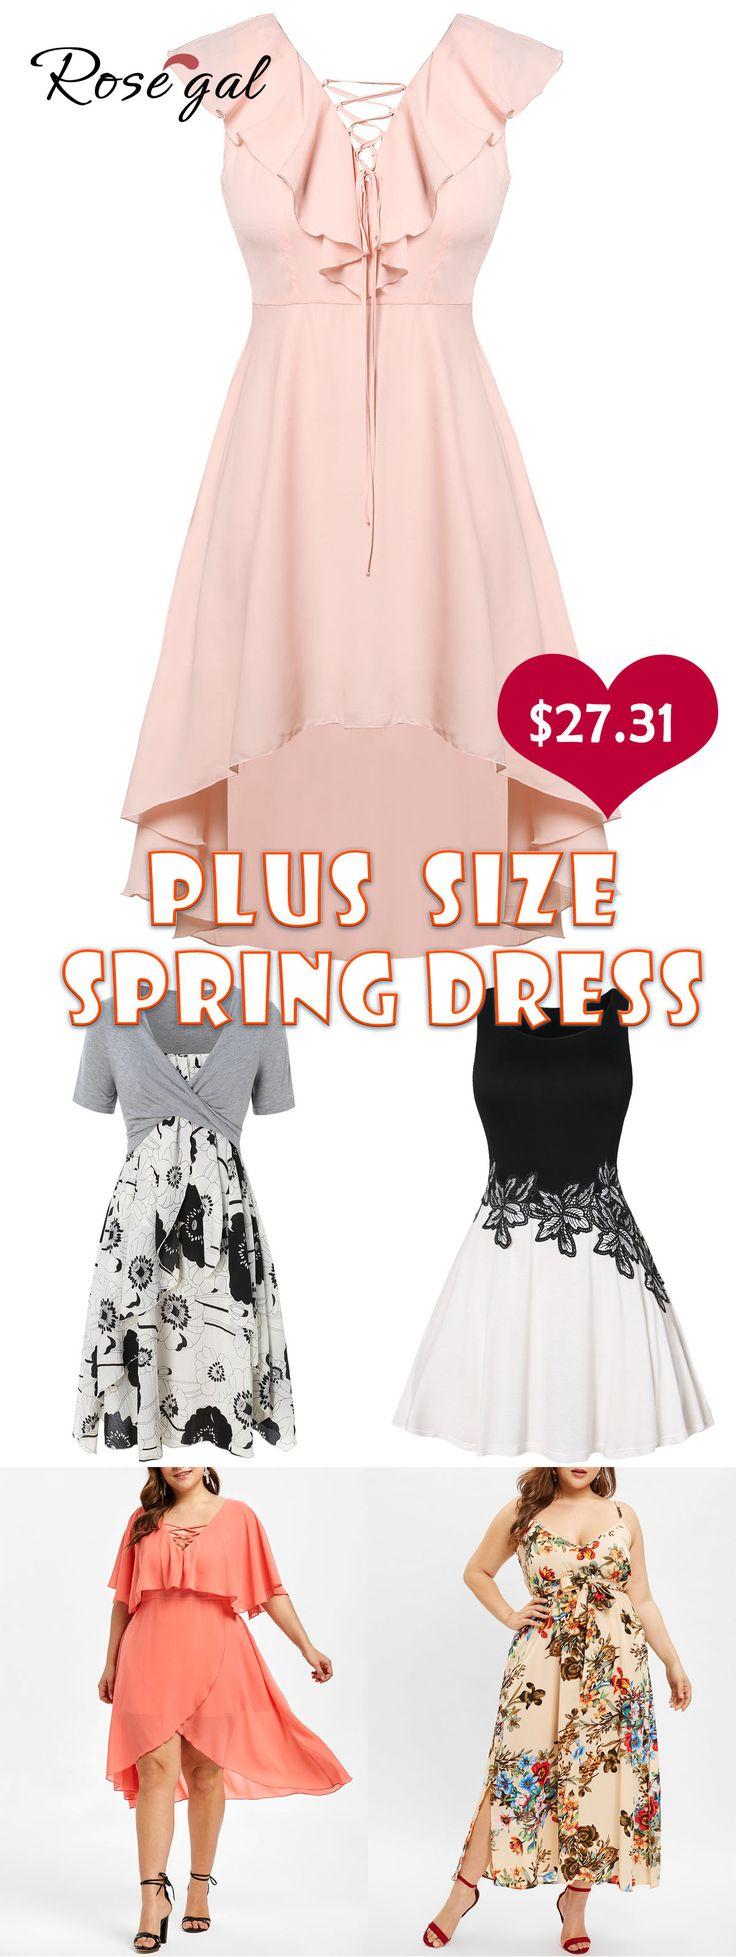 Rosegal plus size Ruffle Embellished Plus Size Lace Up Dress 7